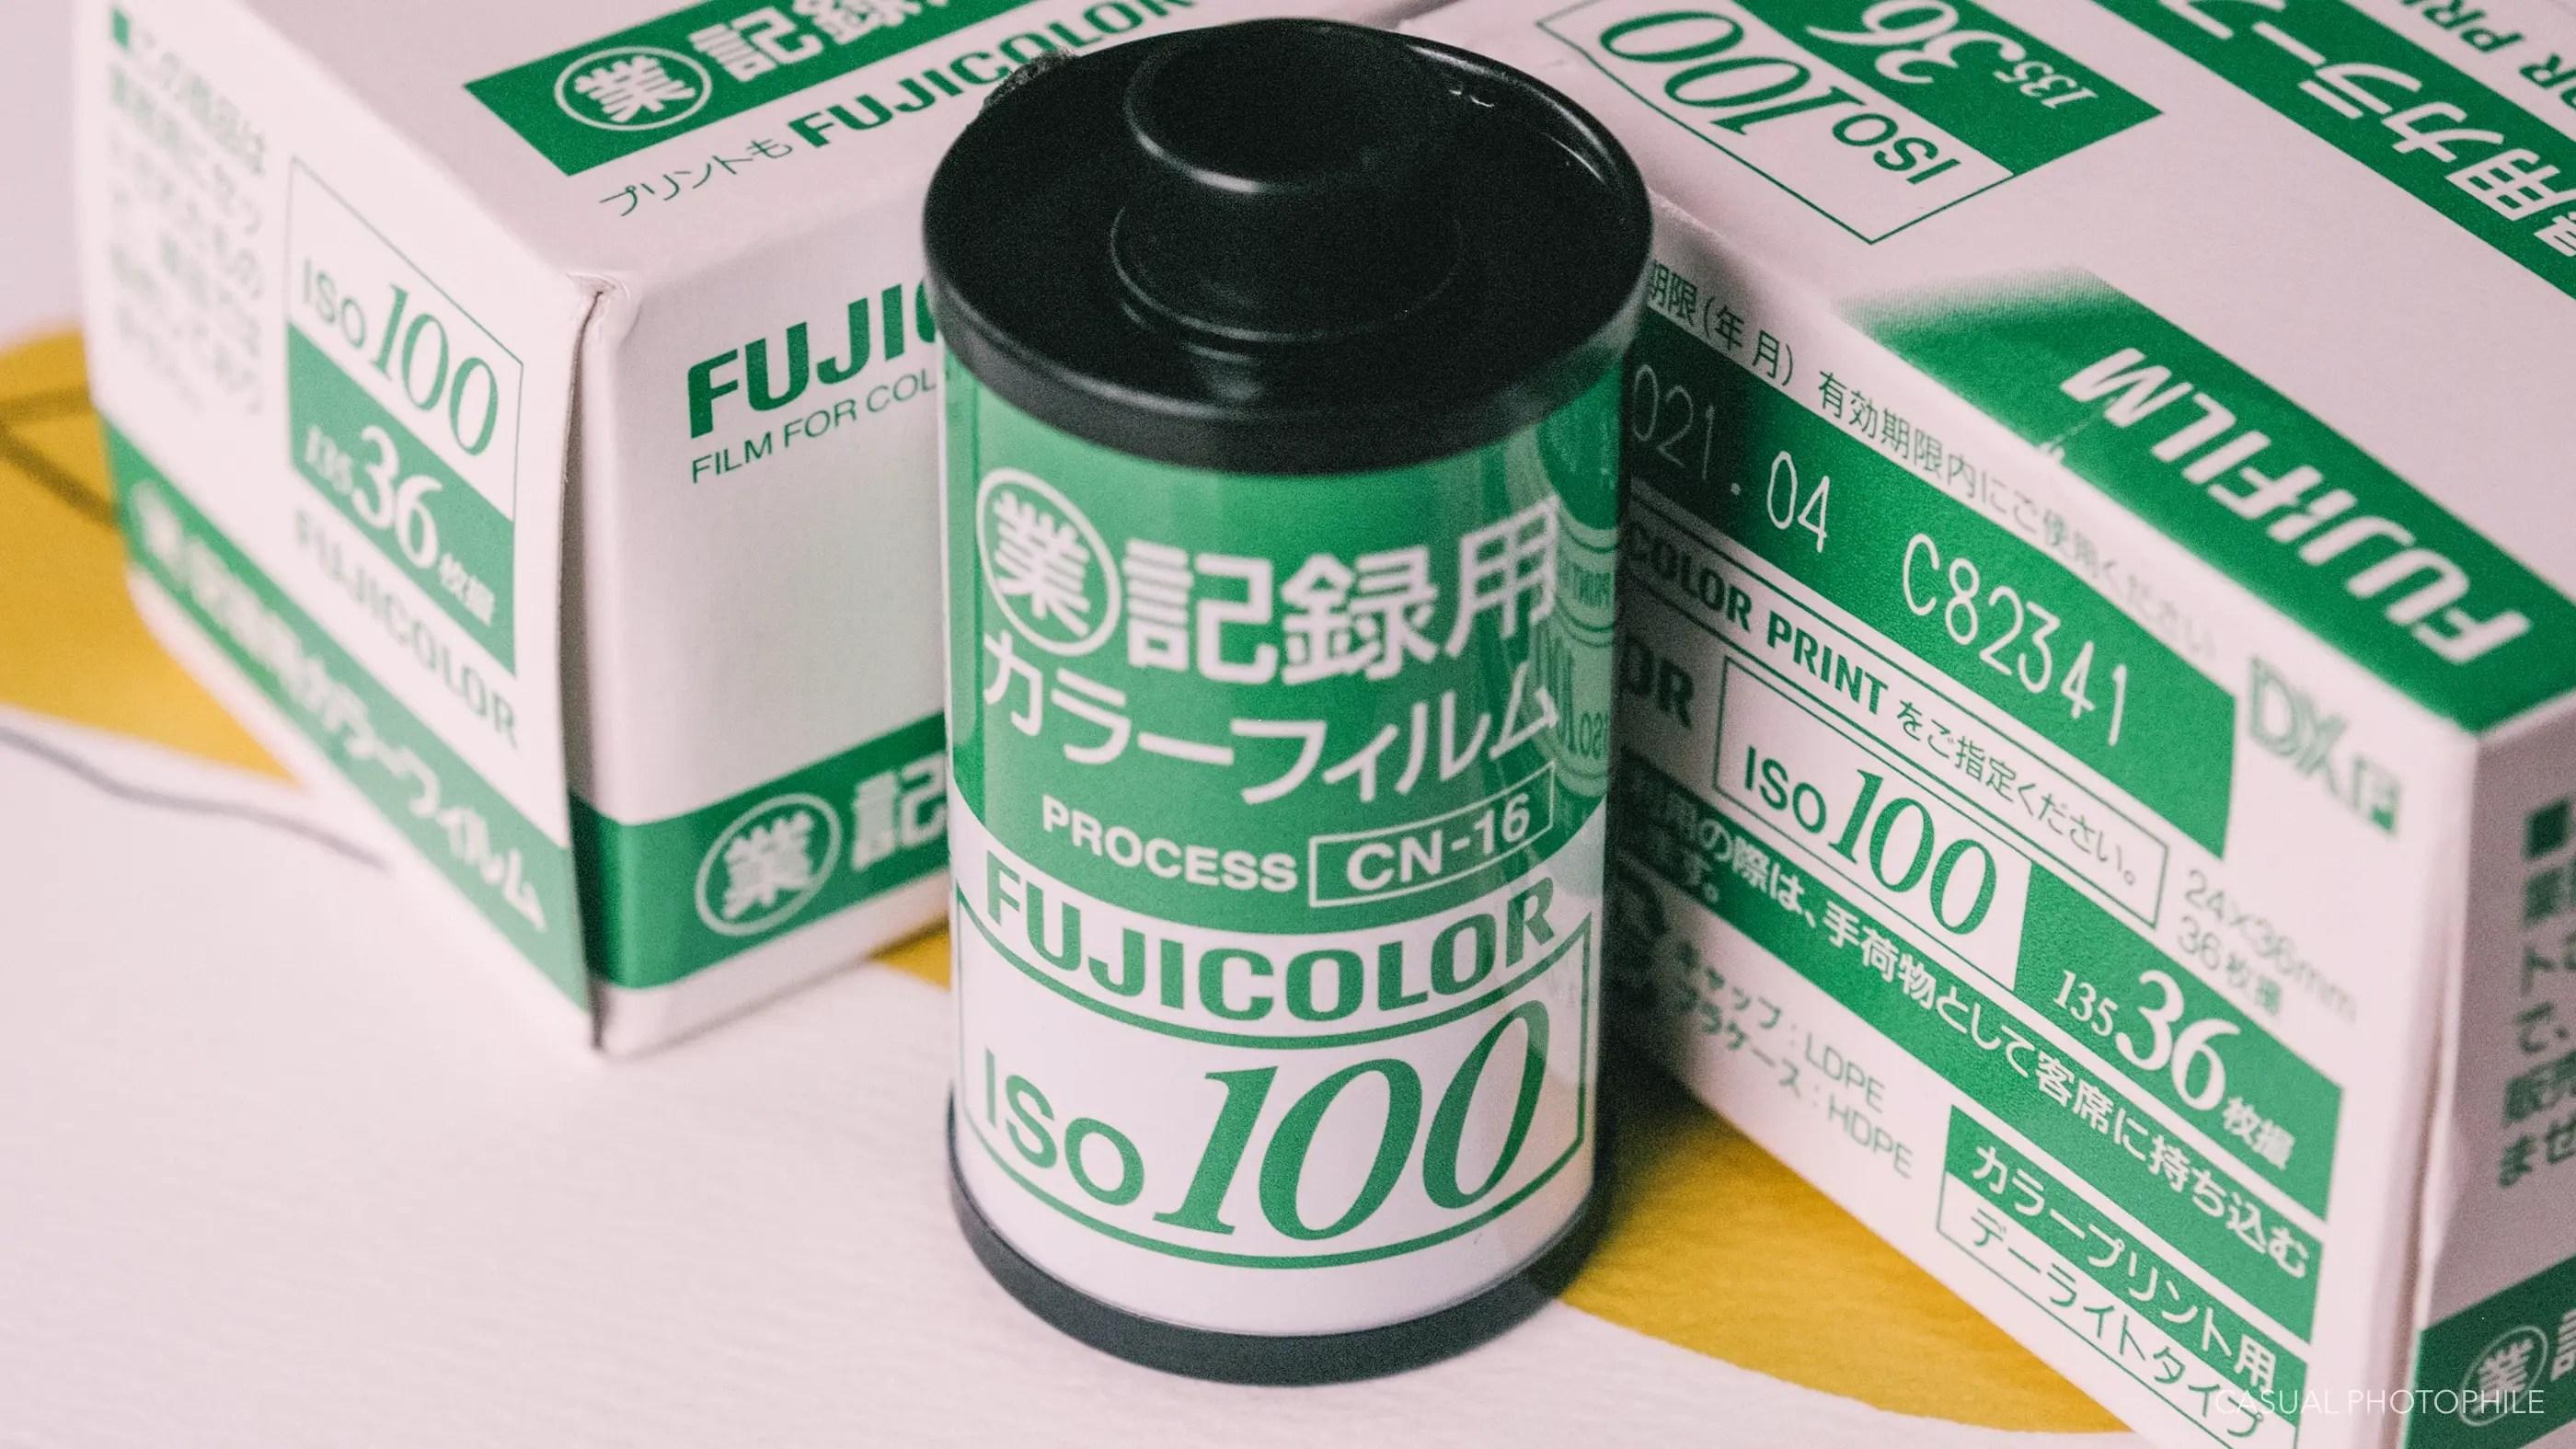 Fujicolor Industrial 100 - Film Profile - Casual Photophile